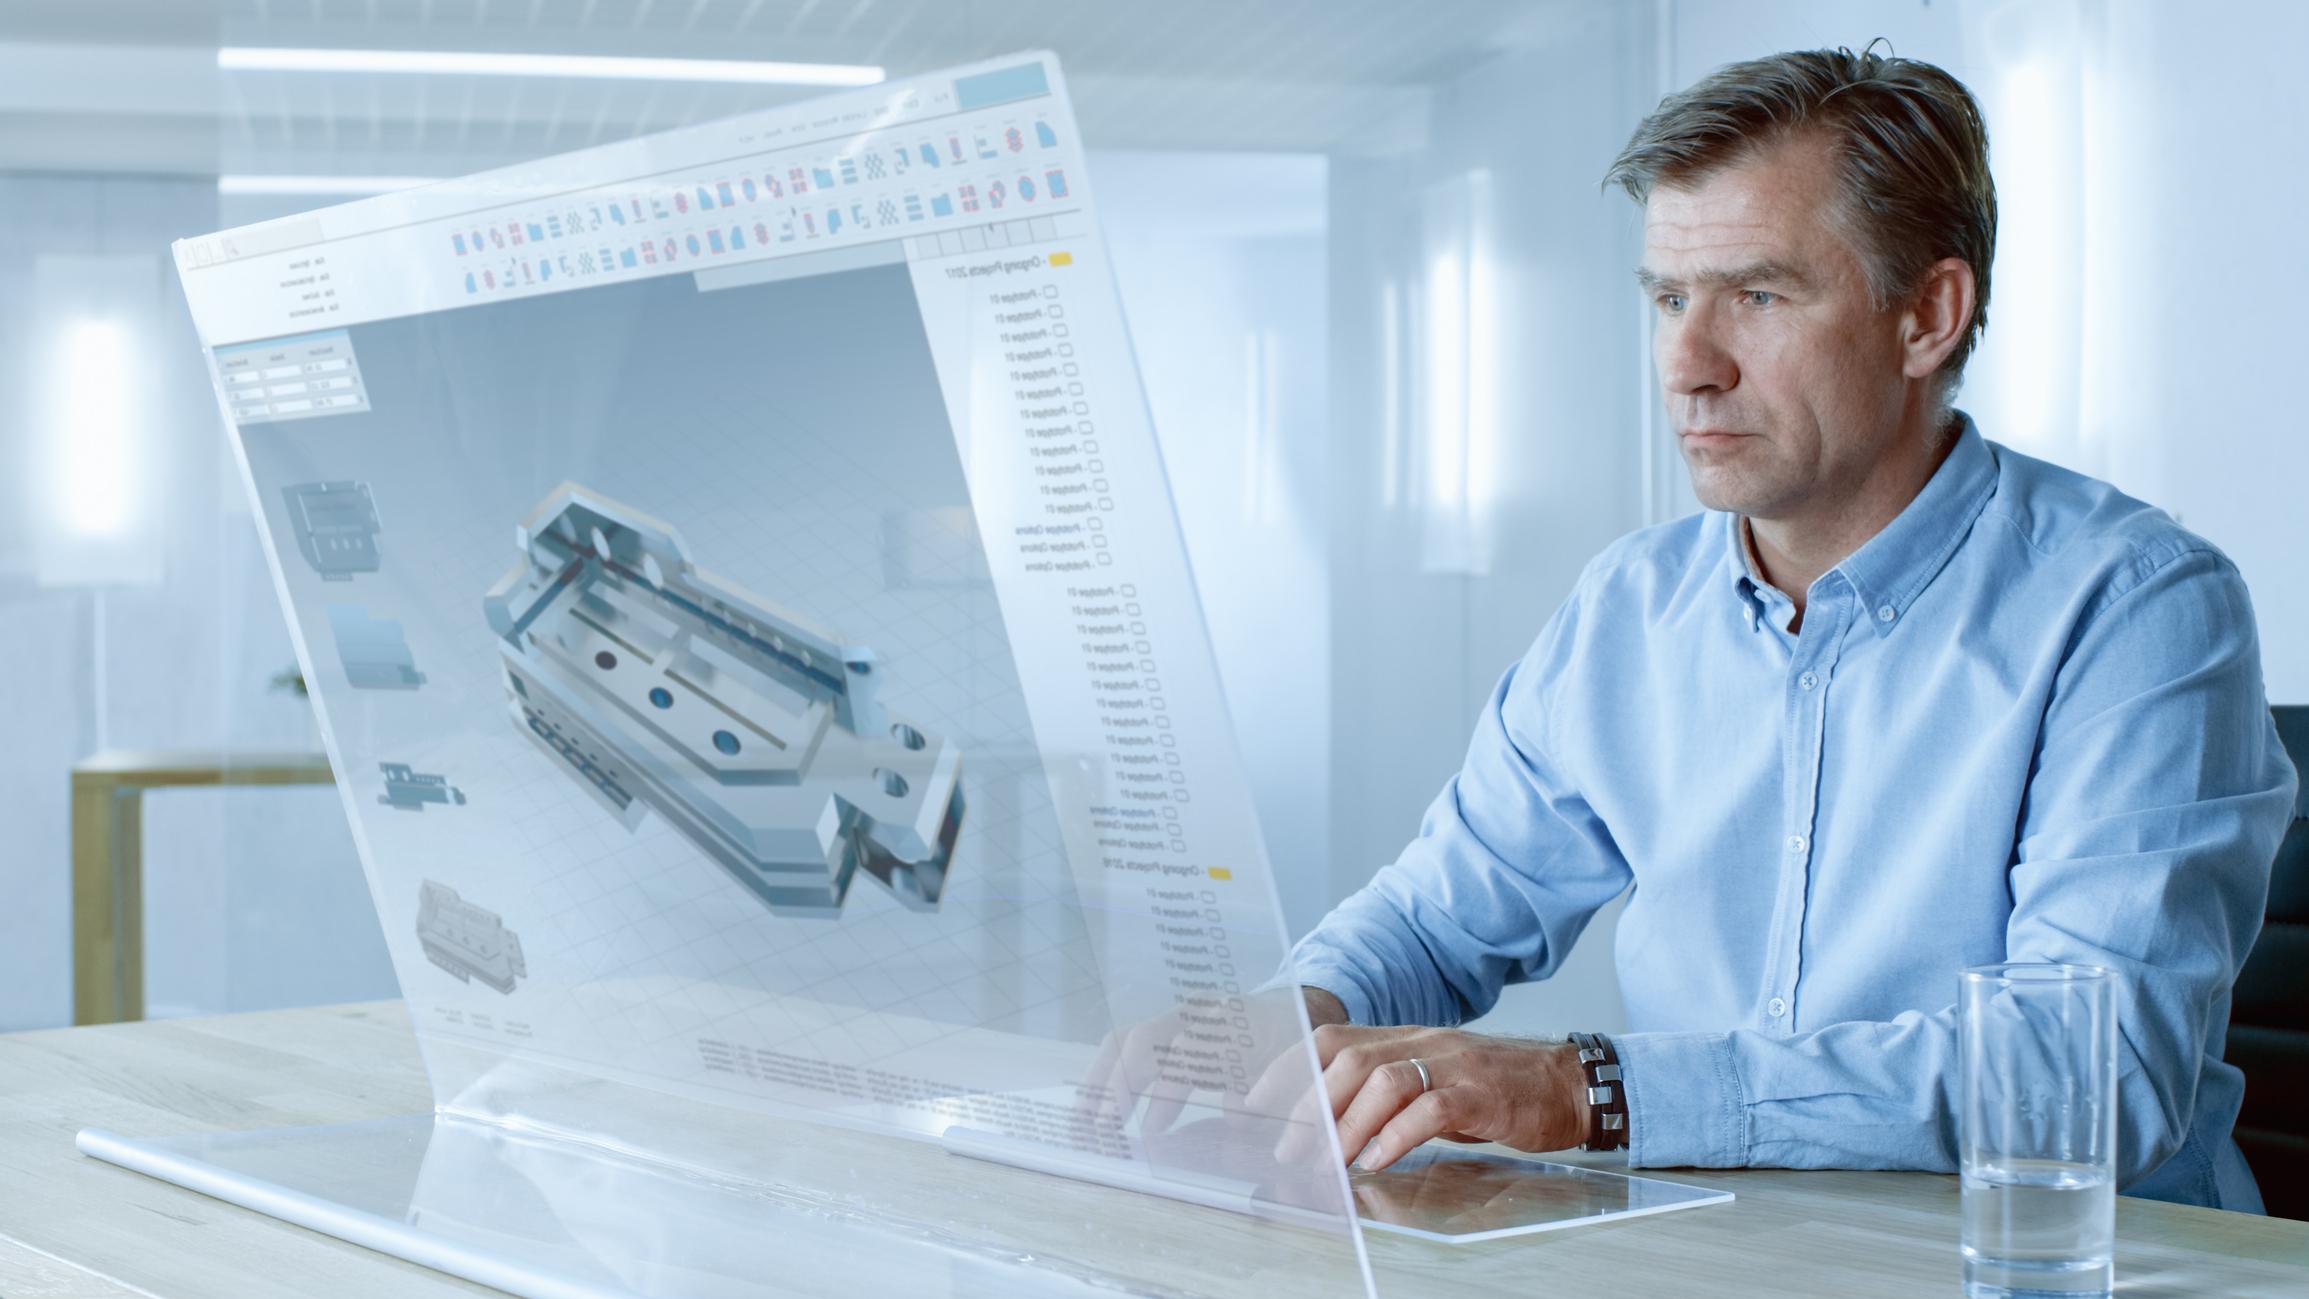 An engineer working on a 3D design